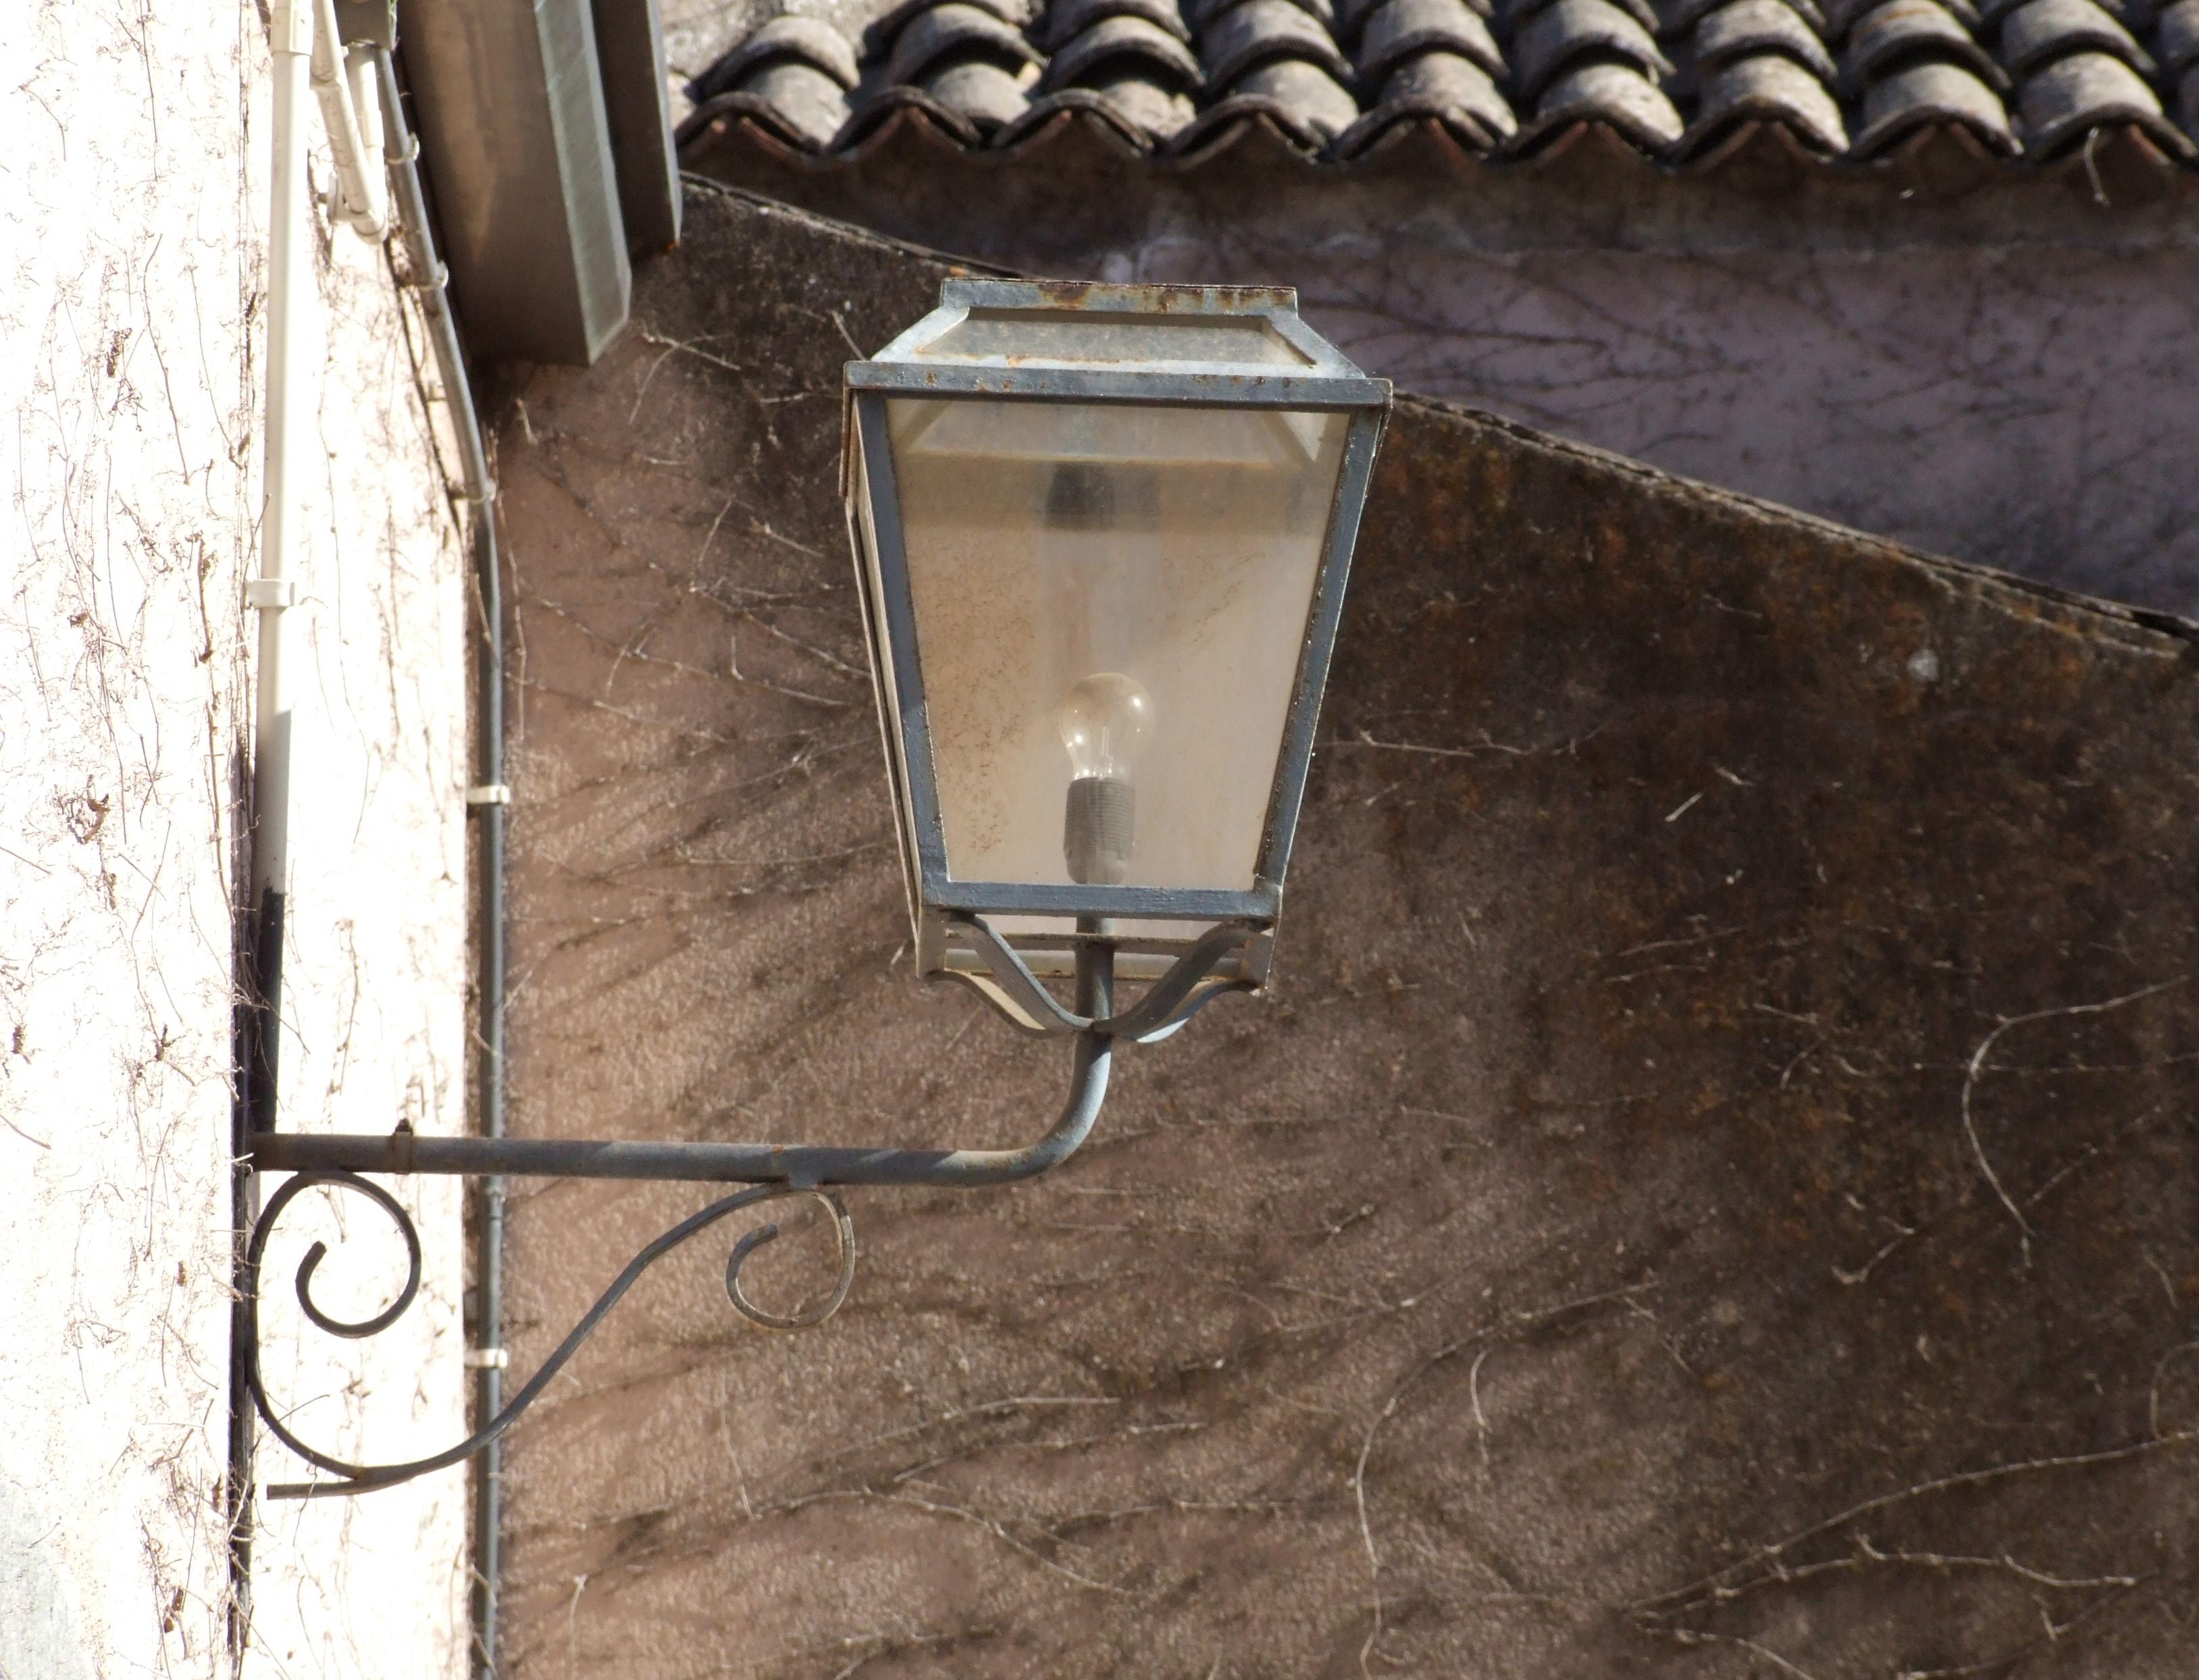 Italy-san_gregorio_di_catania - creative commons by gnuckx photo